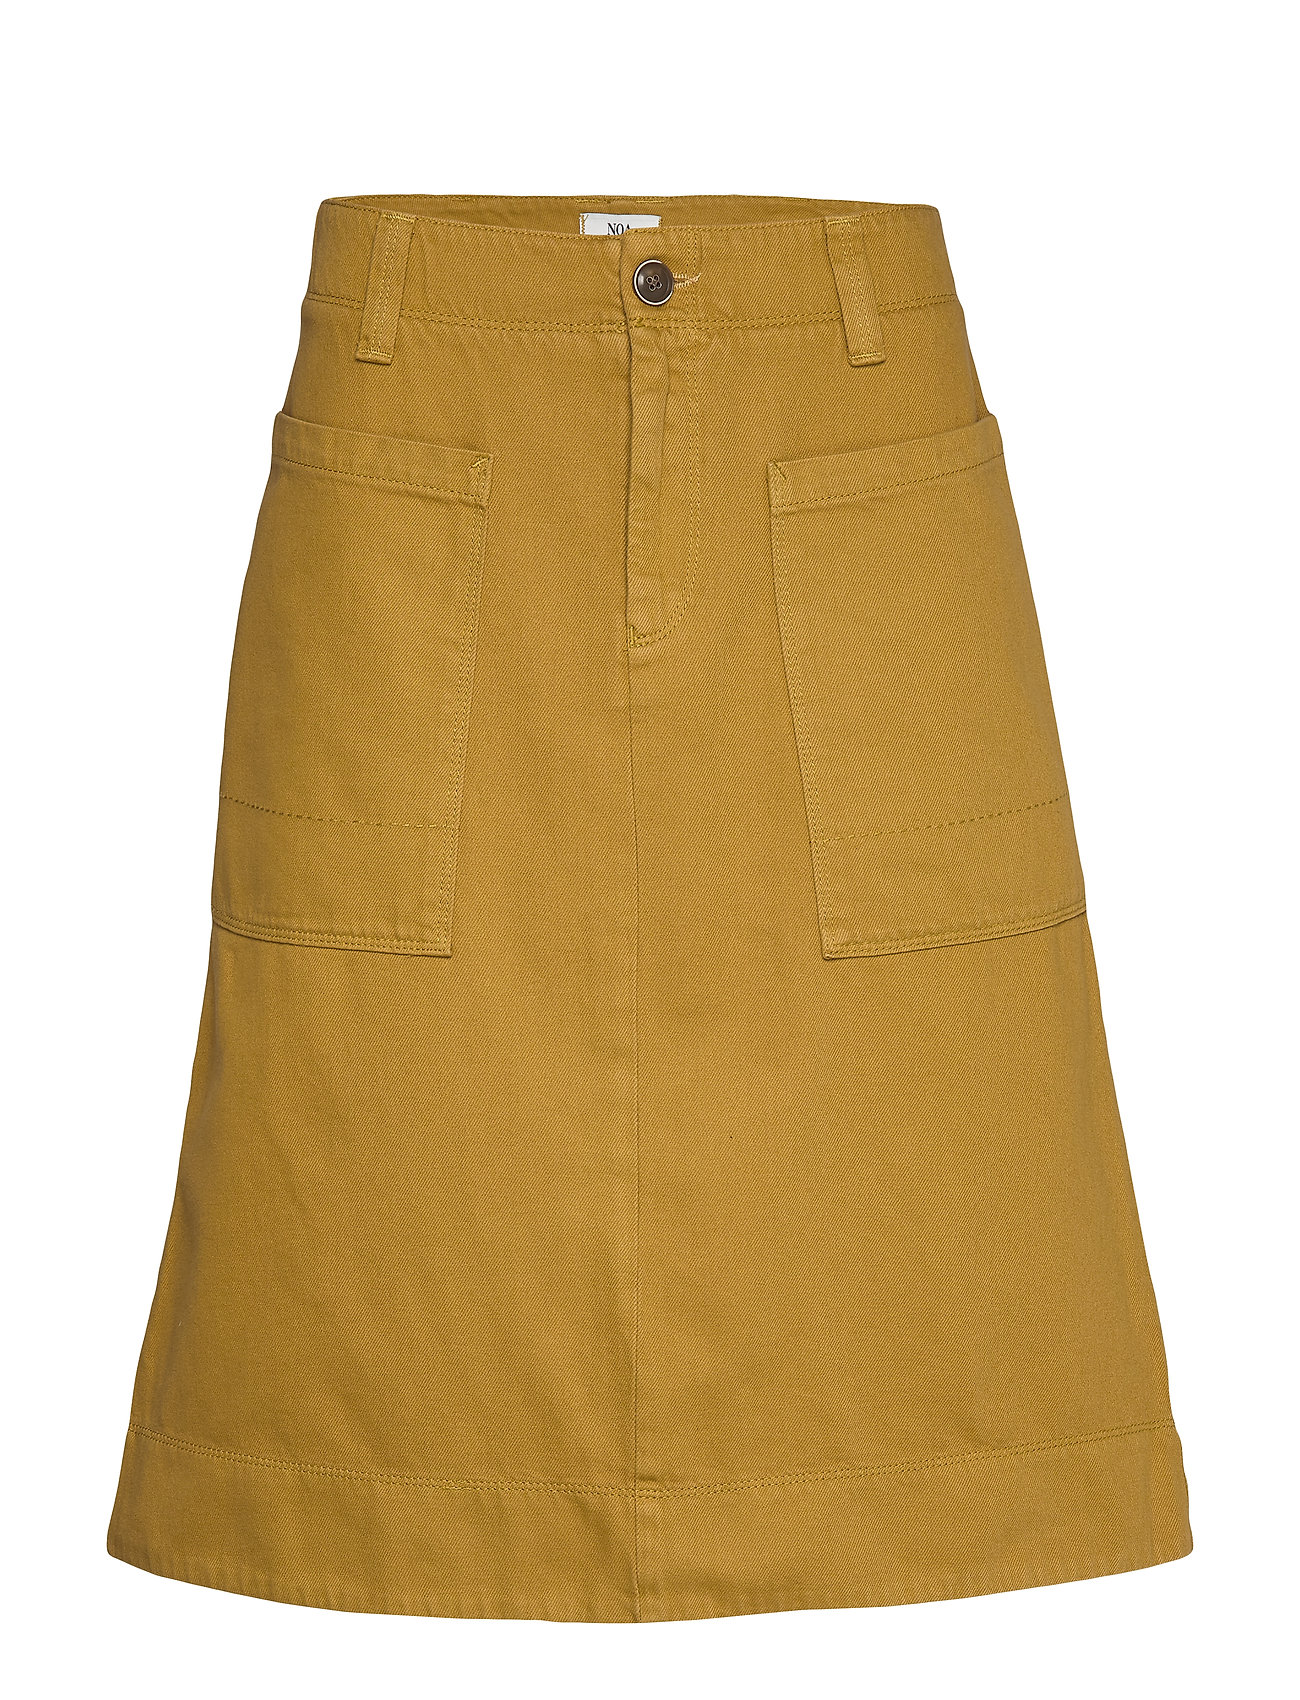 Noa Noa Skirt - BRONZE MIST